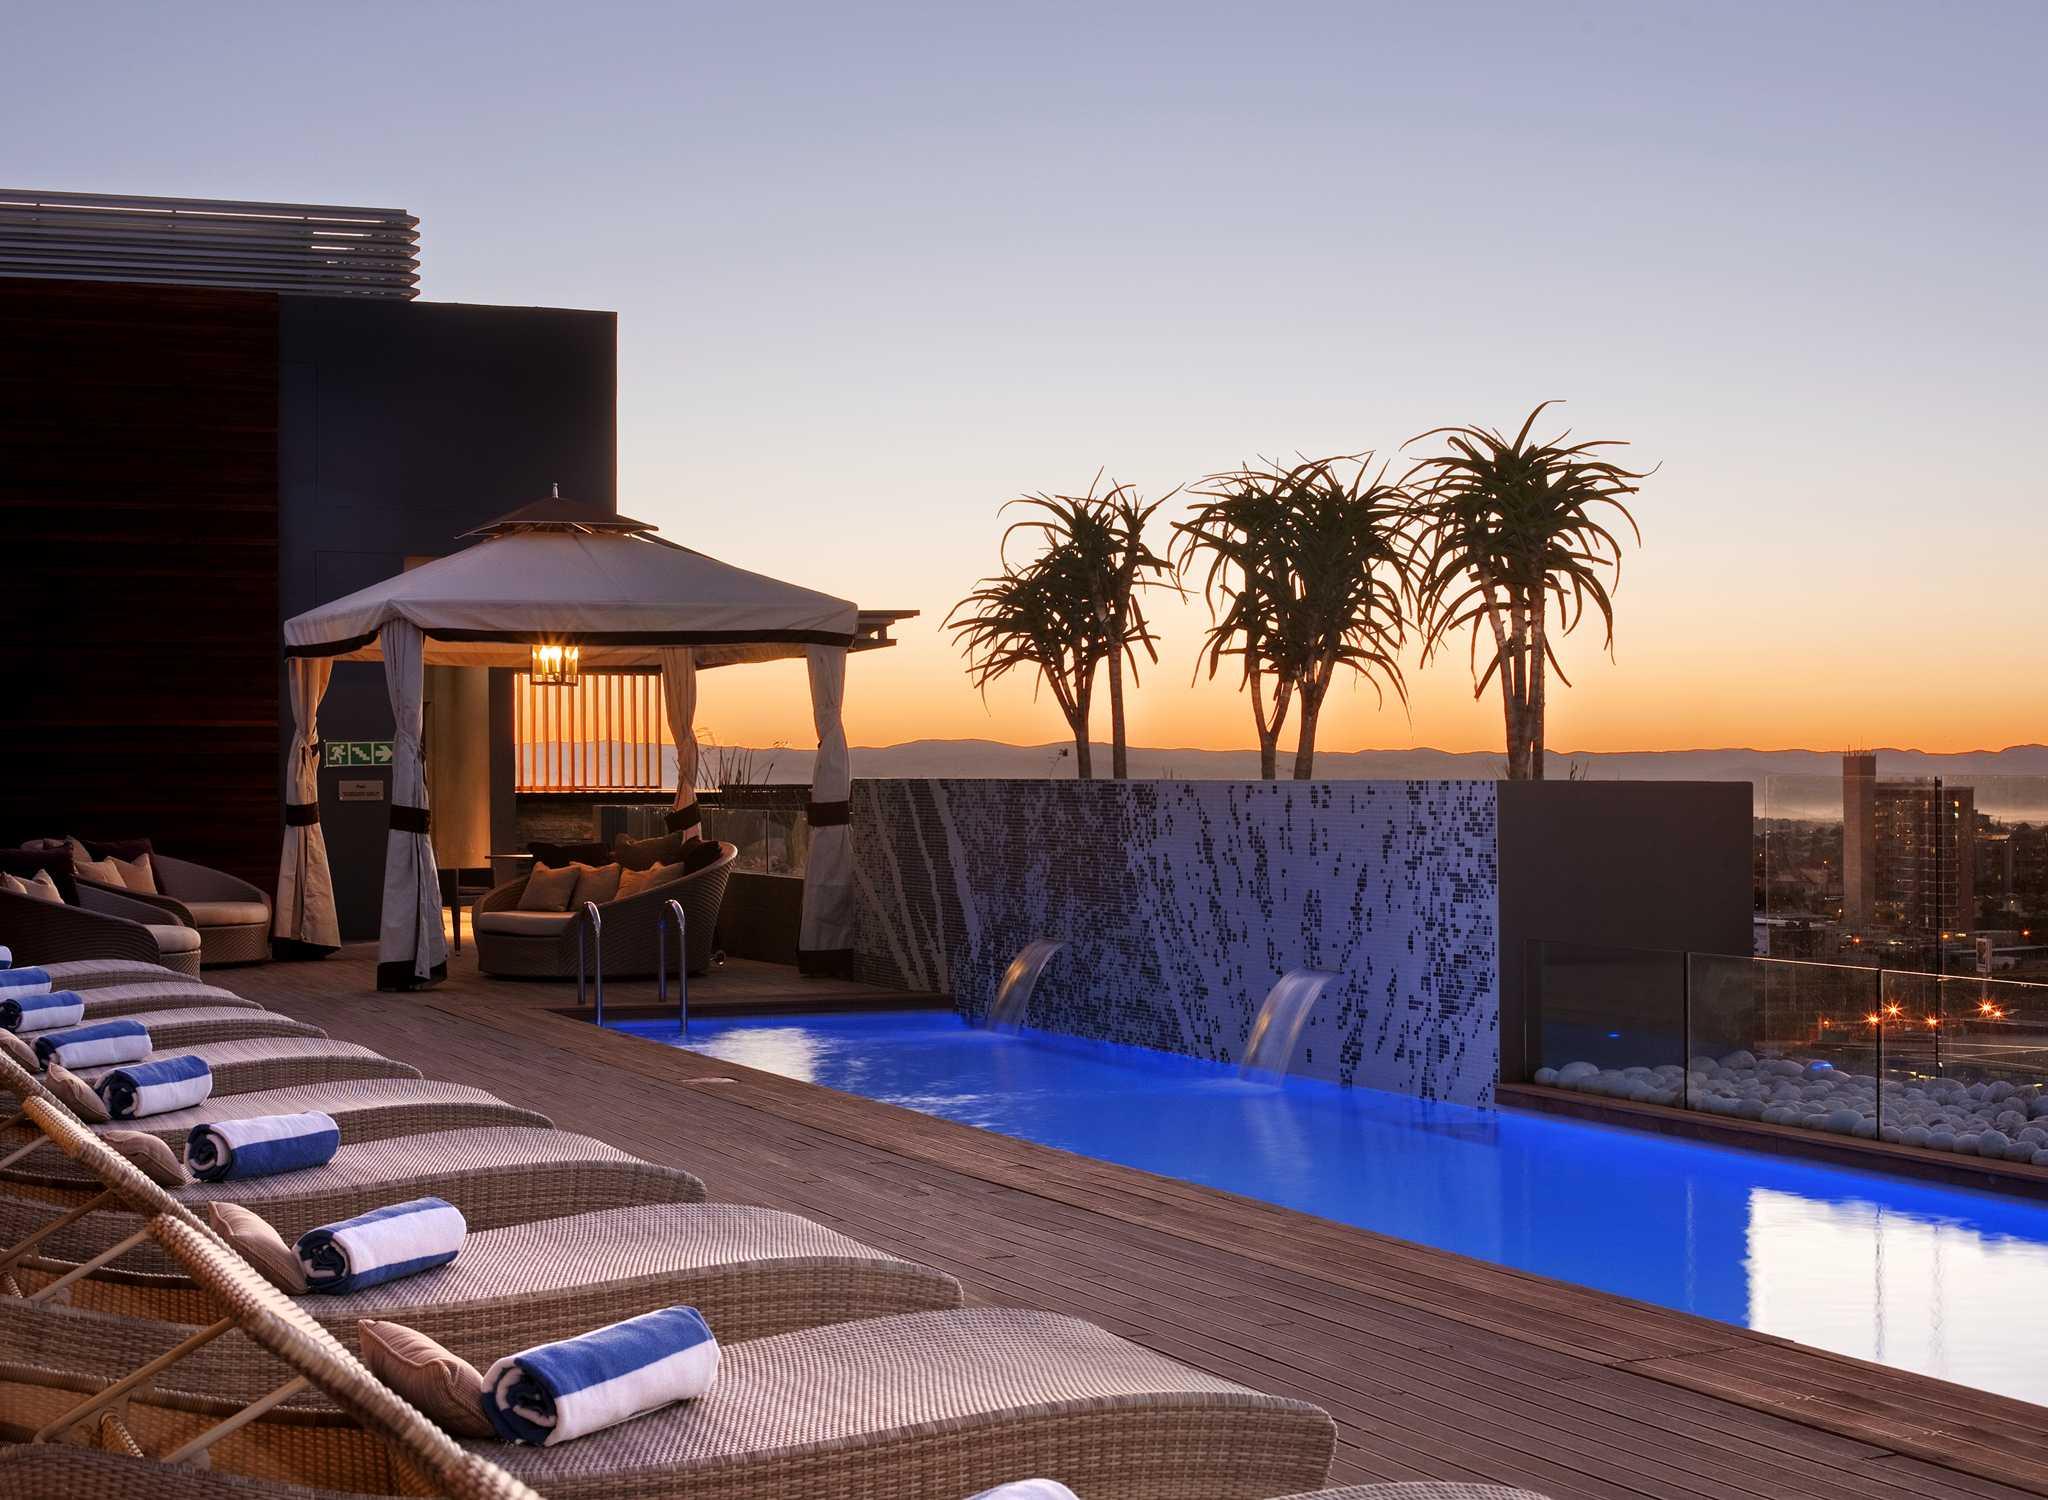 Hilton Hotel Dubrovnik Spa